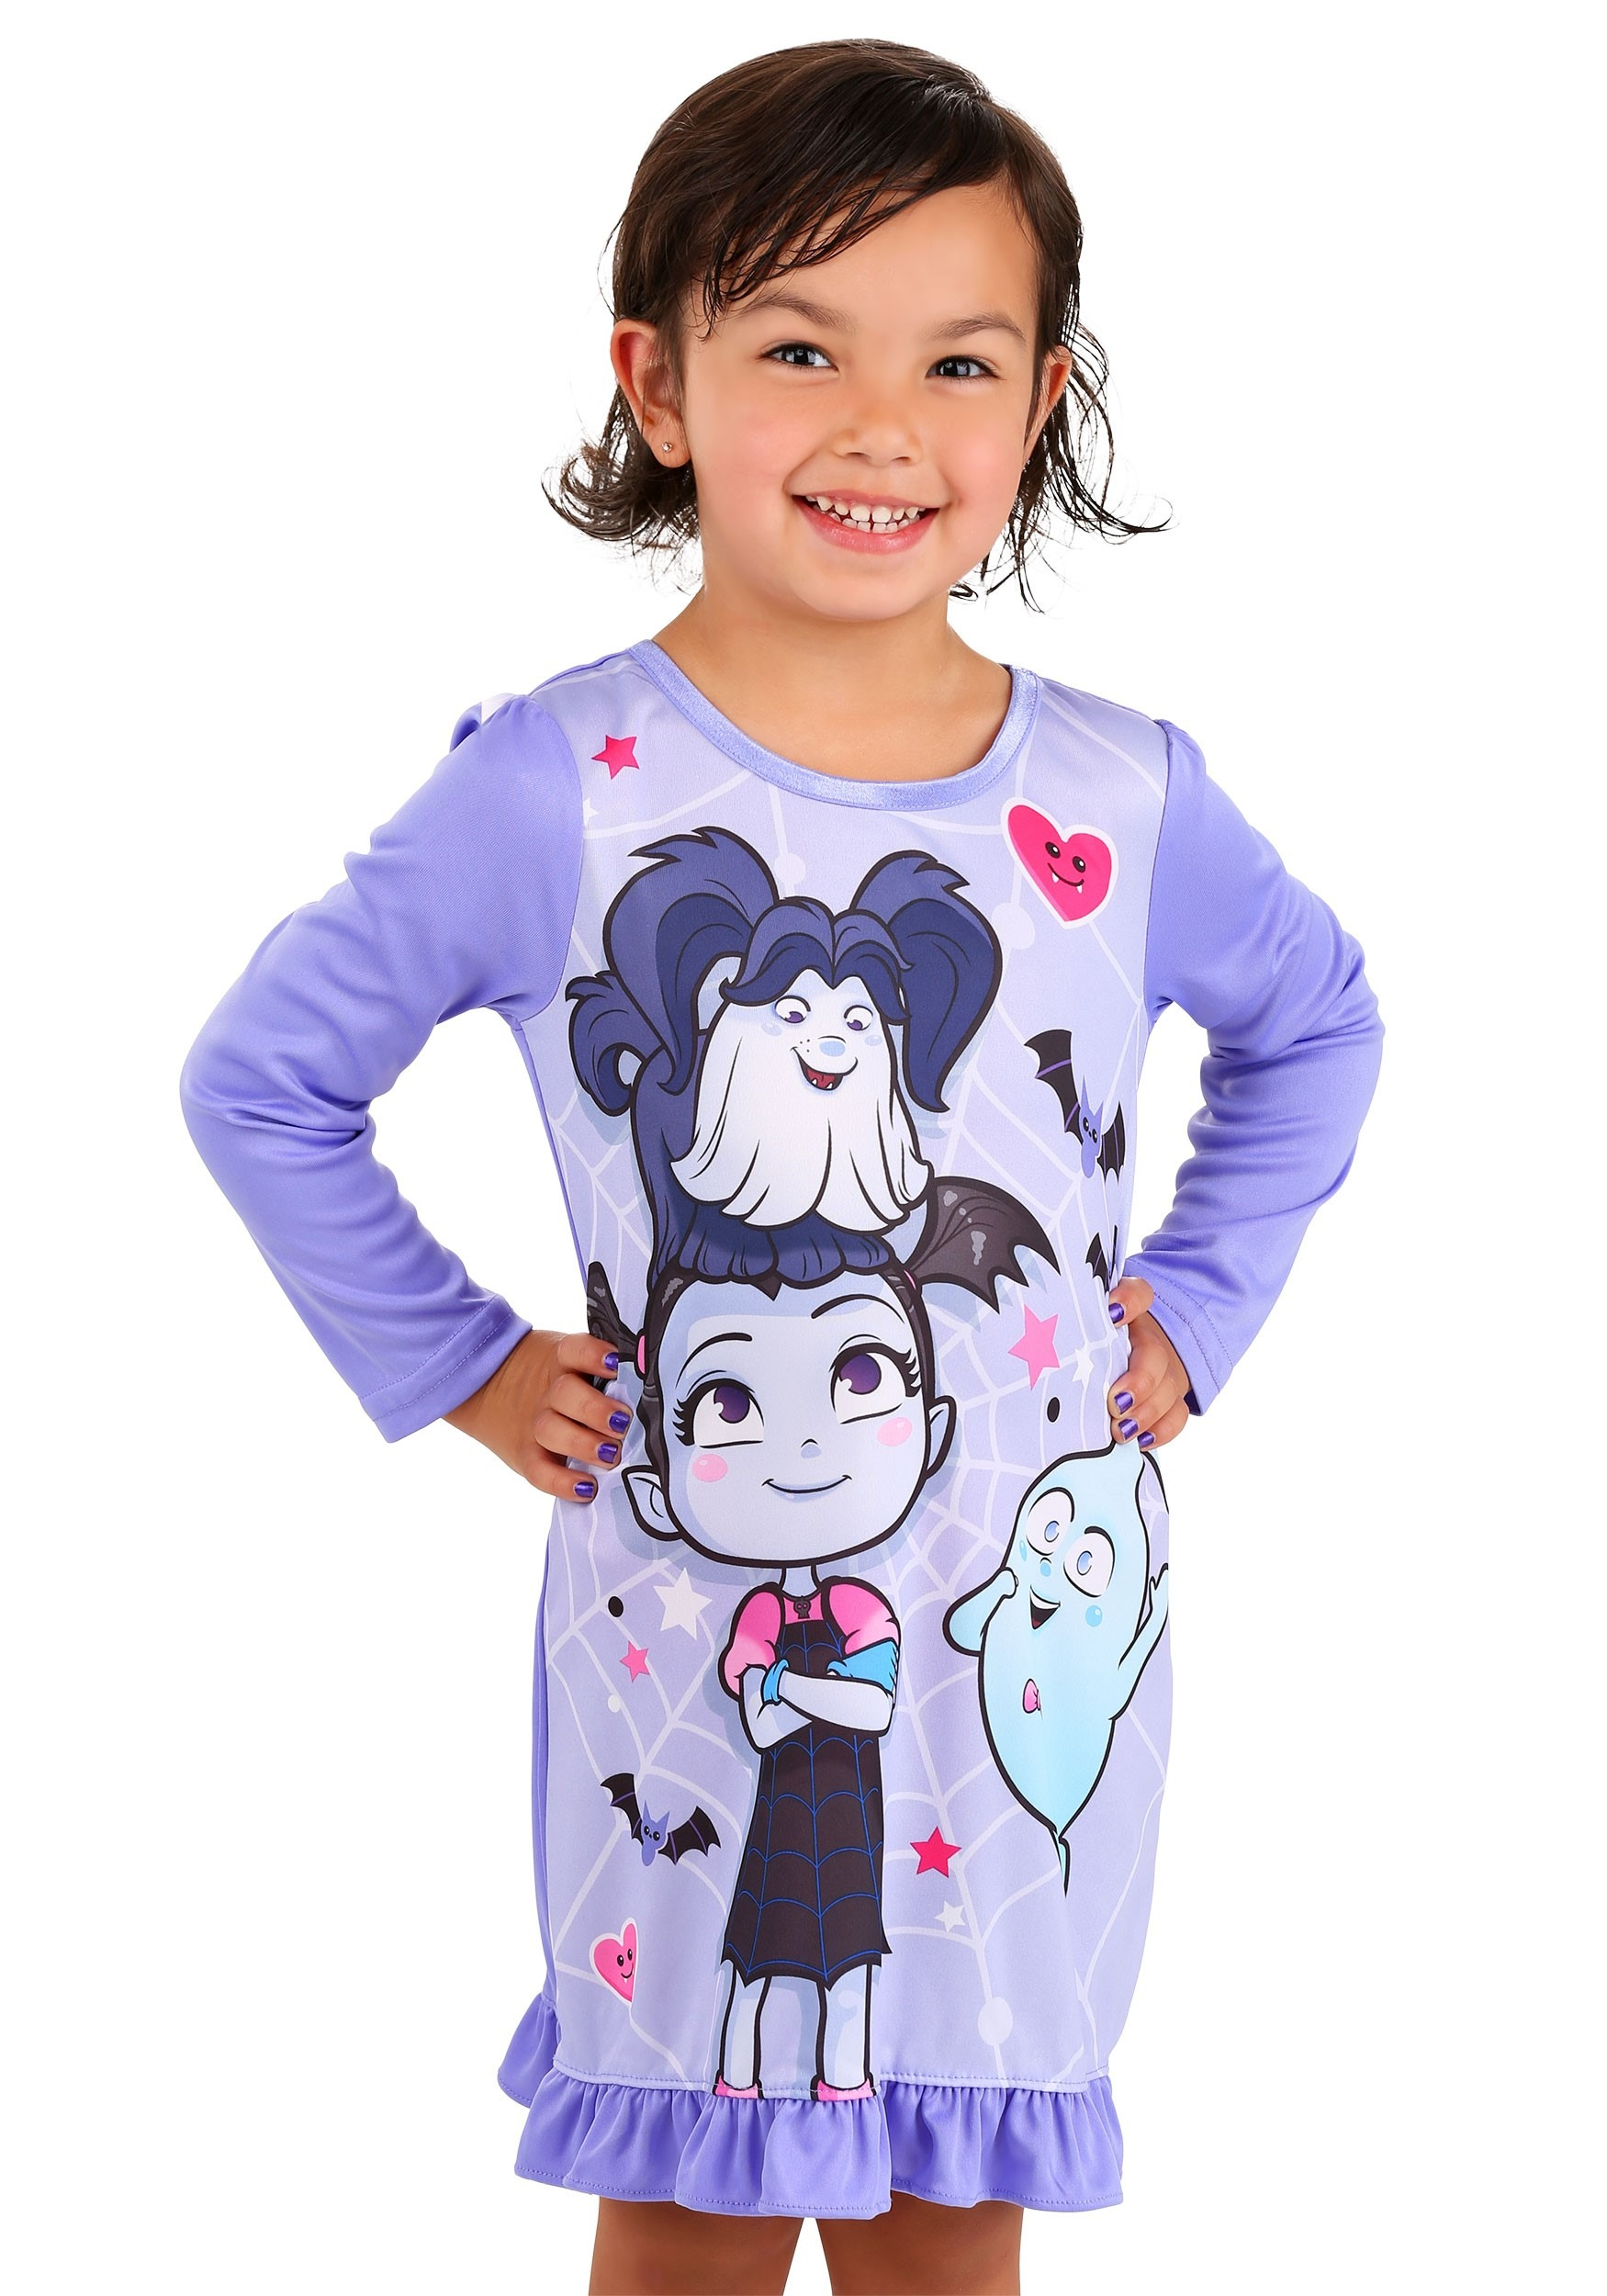 Vampirina Dorm Nightgown for Girls